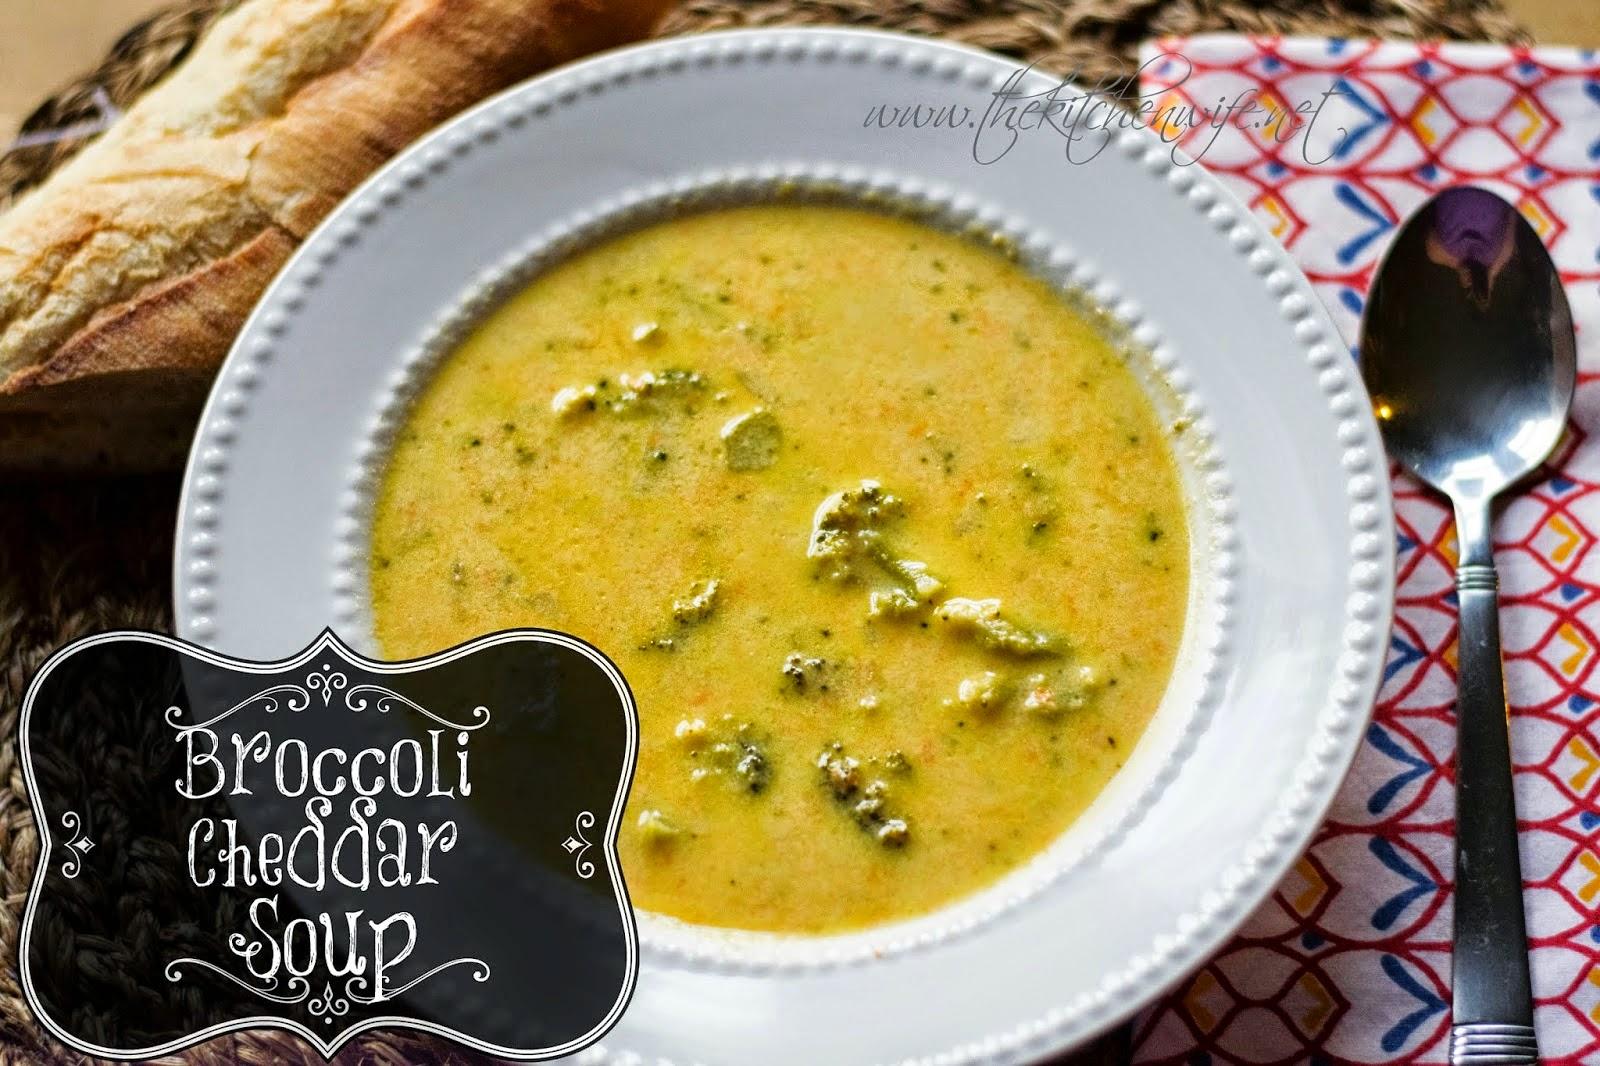 soup, recipe, cheesy, broccoli, classic, homemade, comfort food